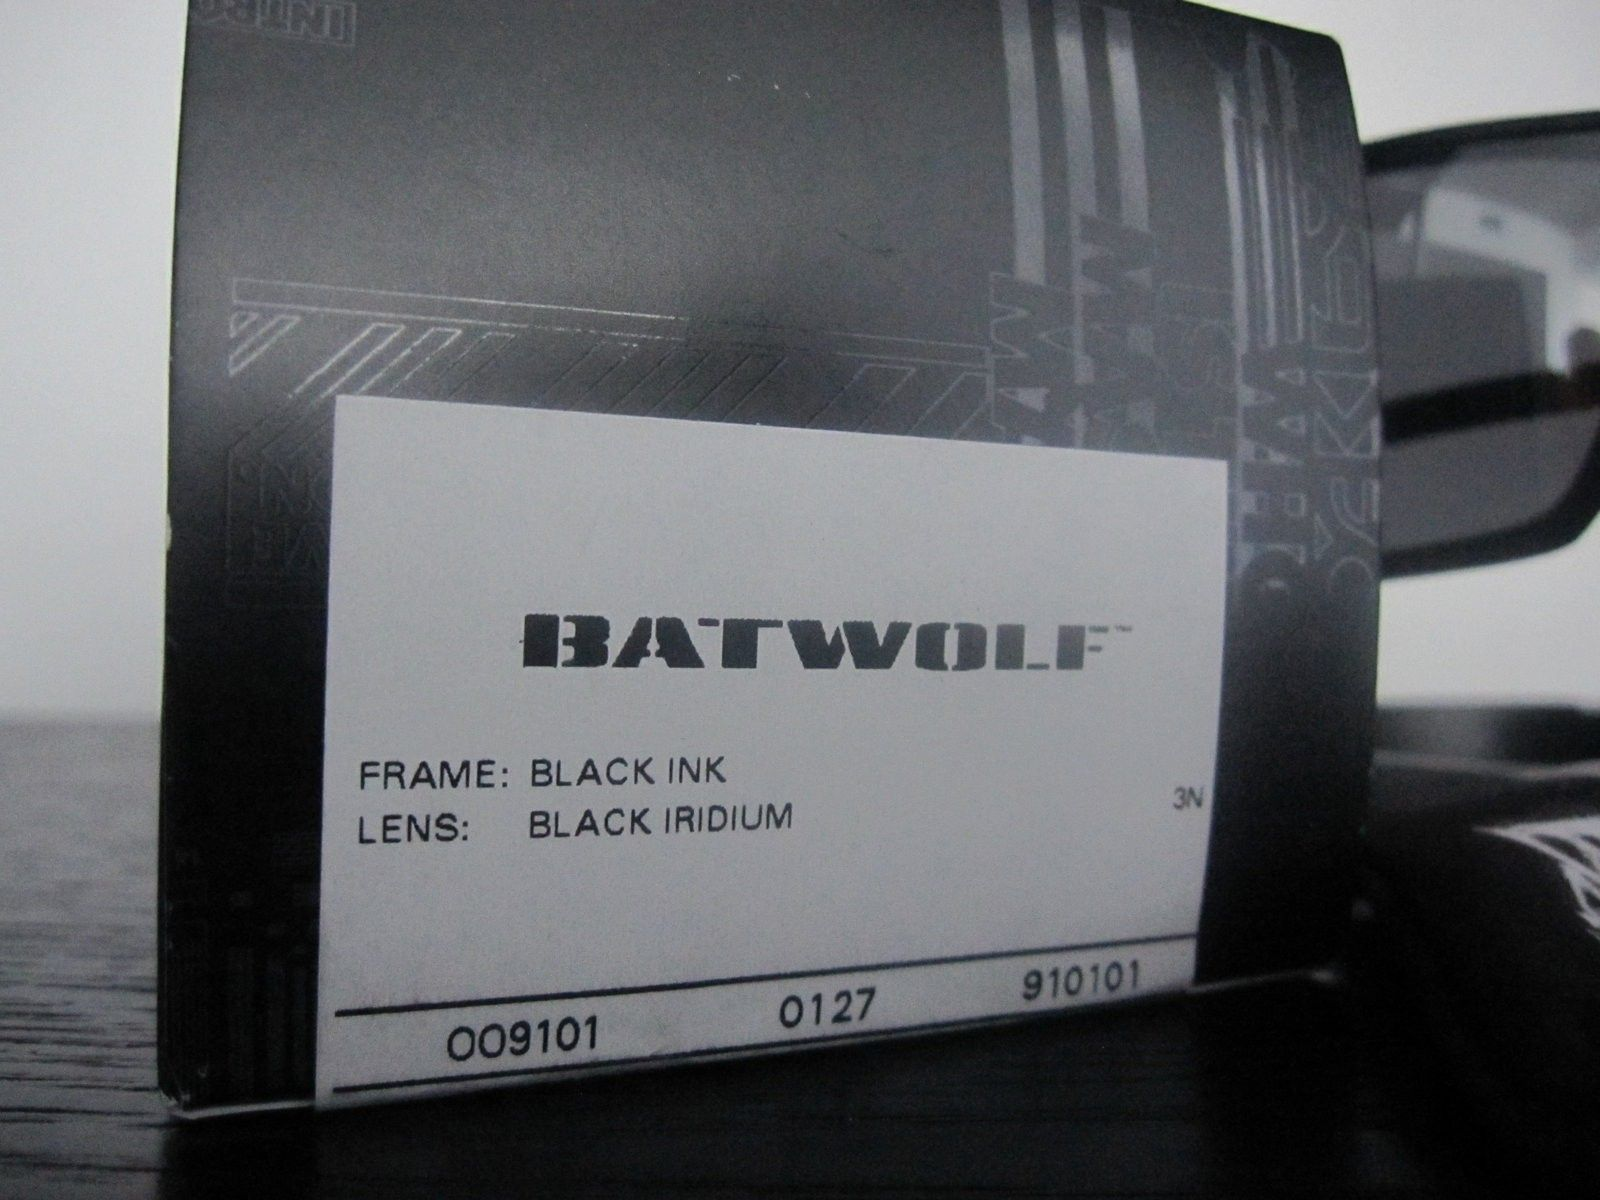 BNIB BATWOLF SKU # 9101-01 - Black Ink / Black Iridium - GONE - IMG_5061.JPG